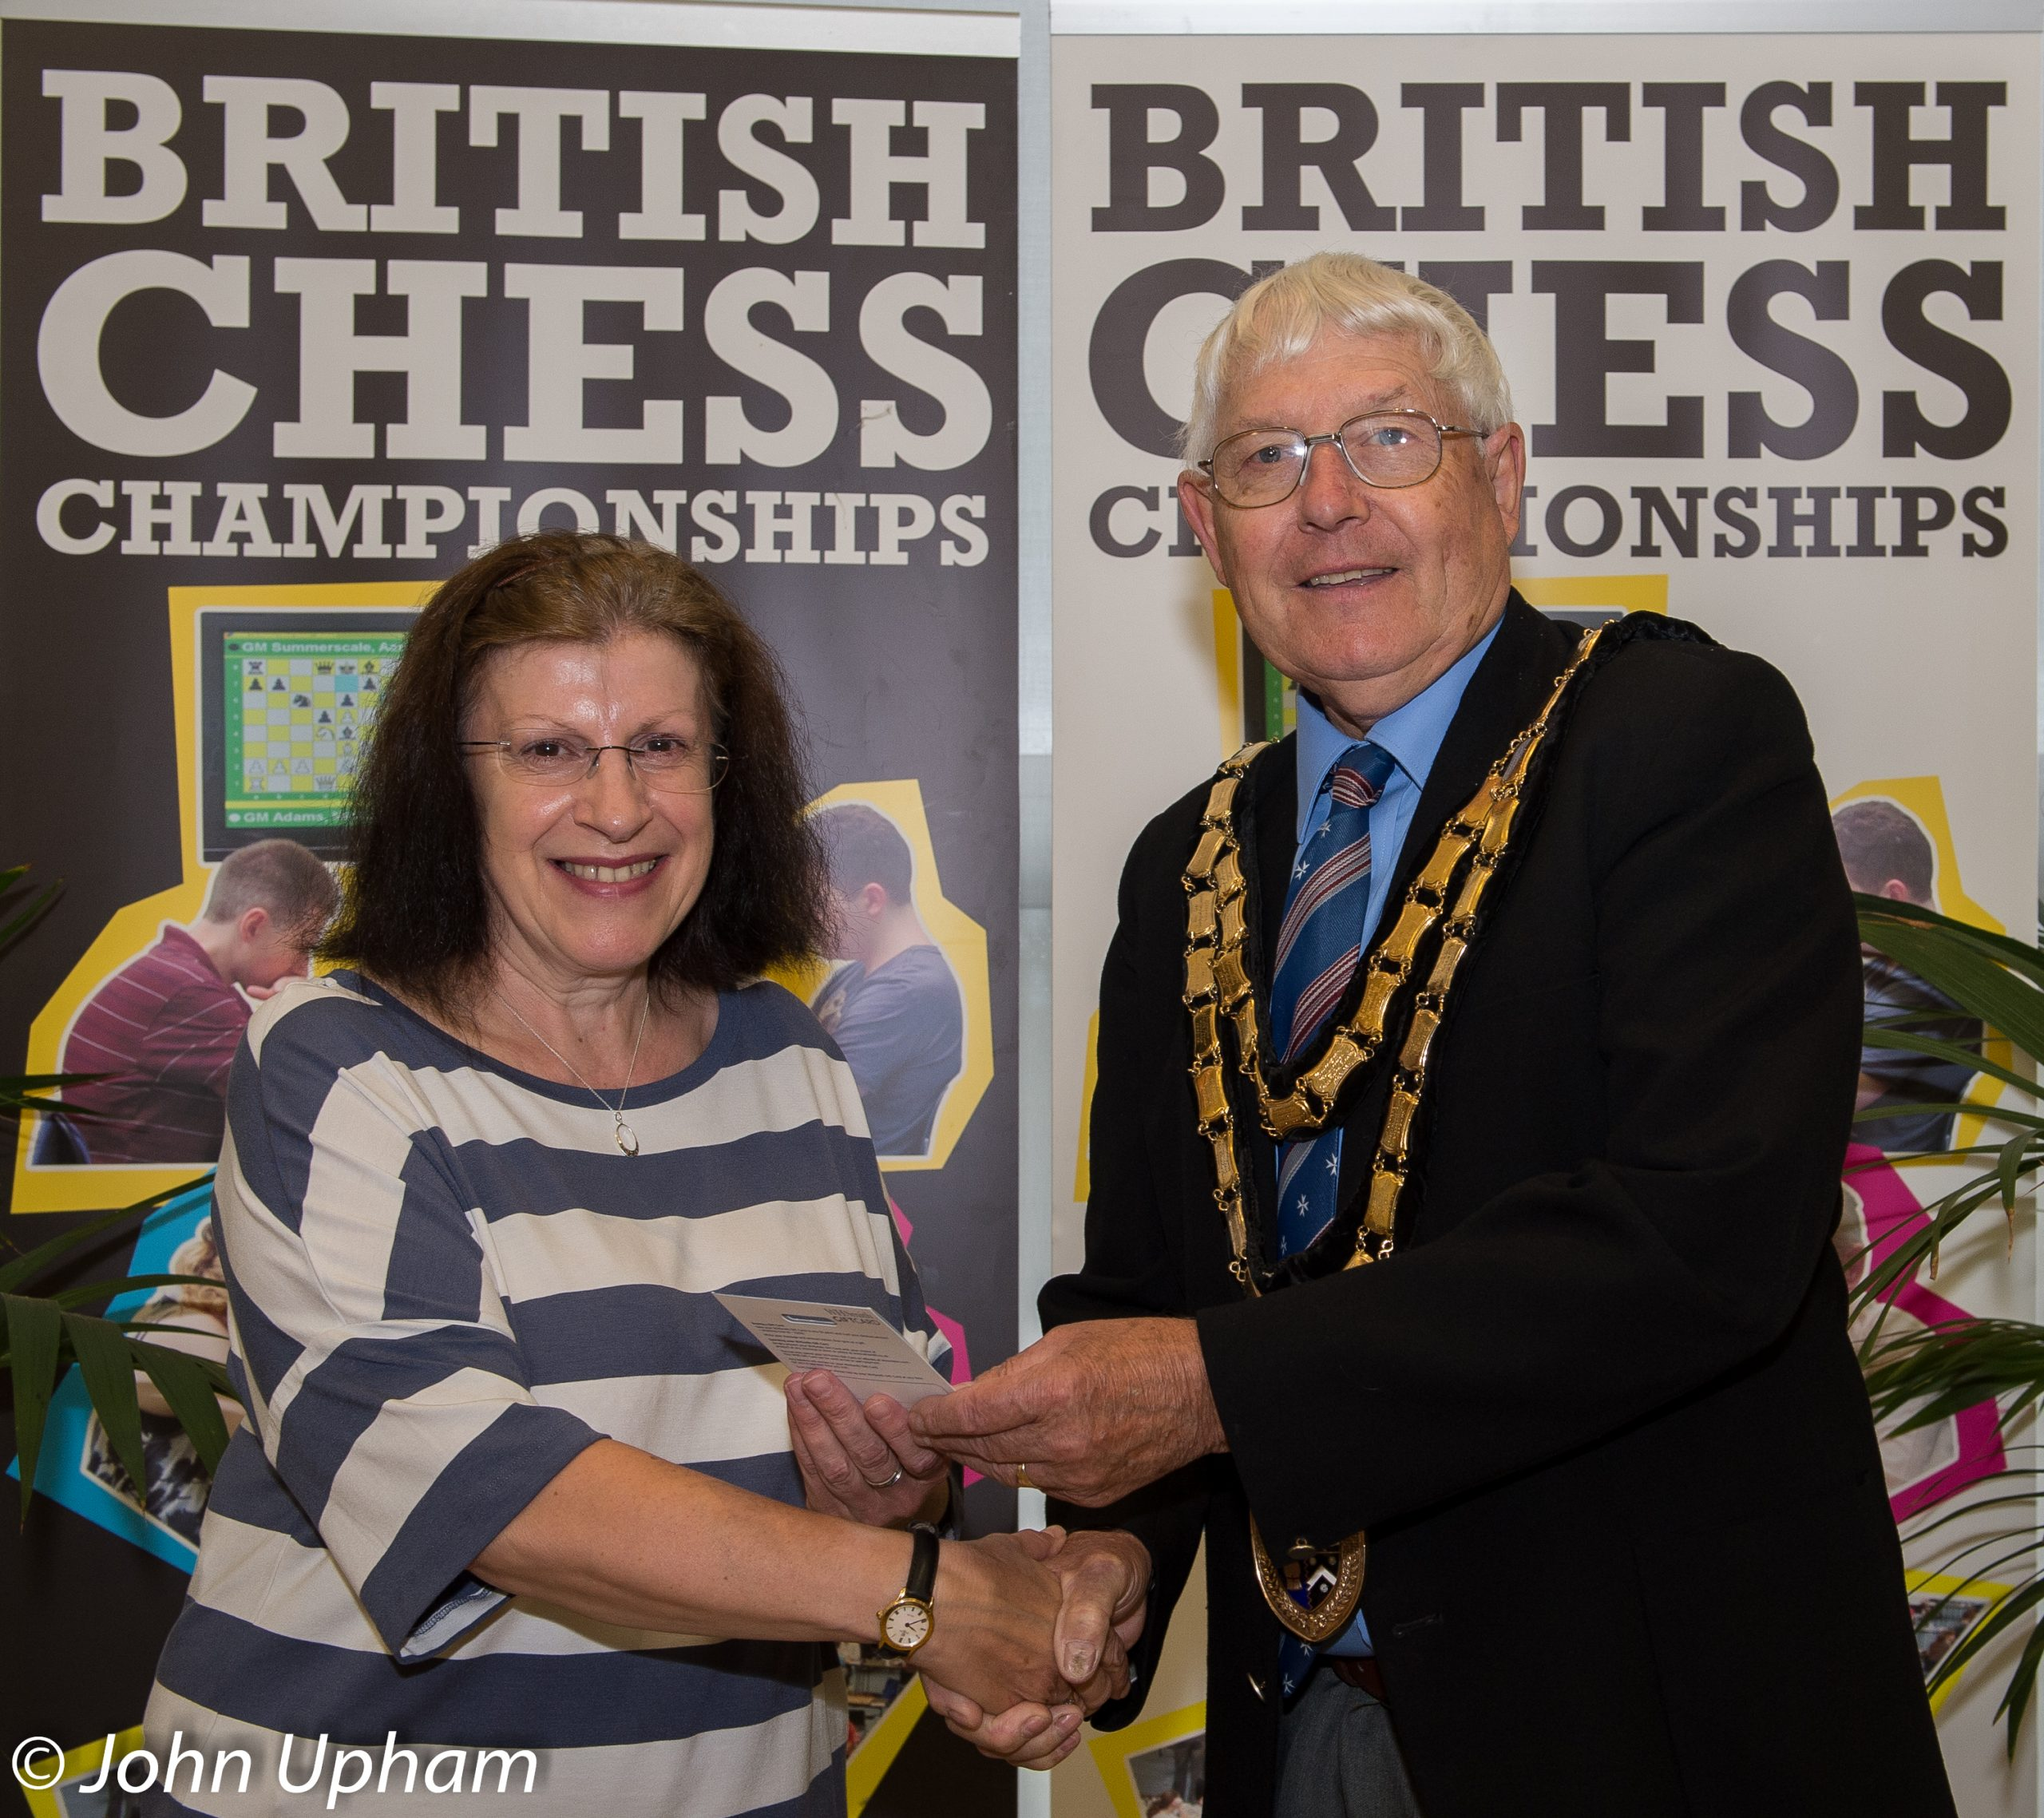 Sheila Jackson at the 2014 British Championships in Aberystwyth